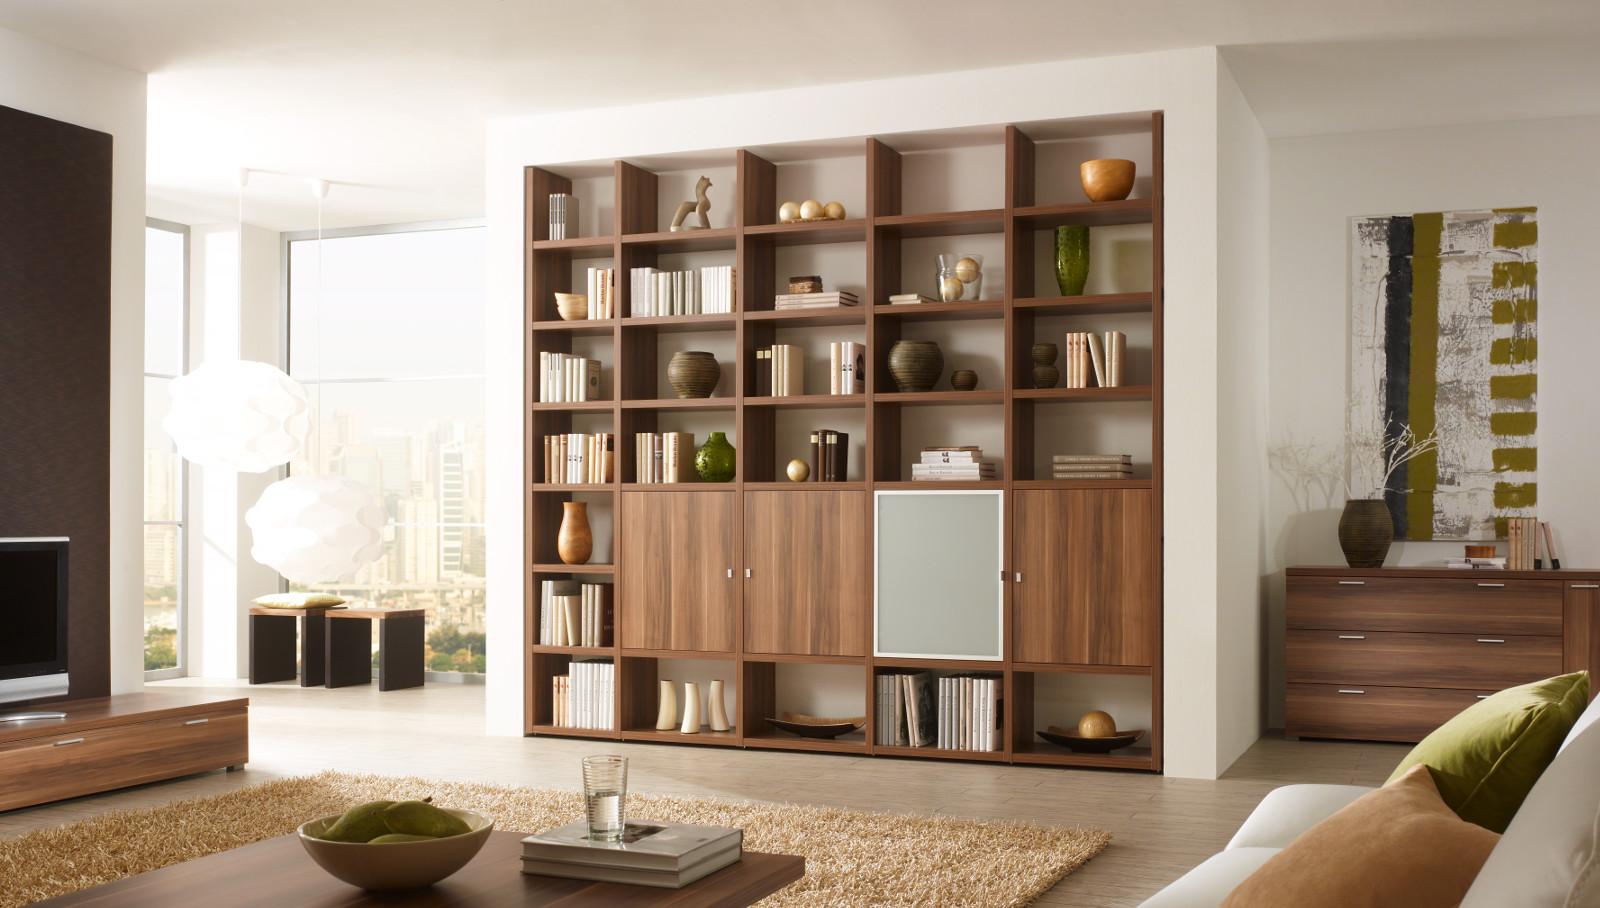 wohnwand b cherwand bibliothek walnuss ma gefertig. Black Bedroom Furniture Sets. Home Design Ideas